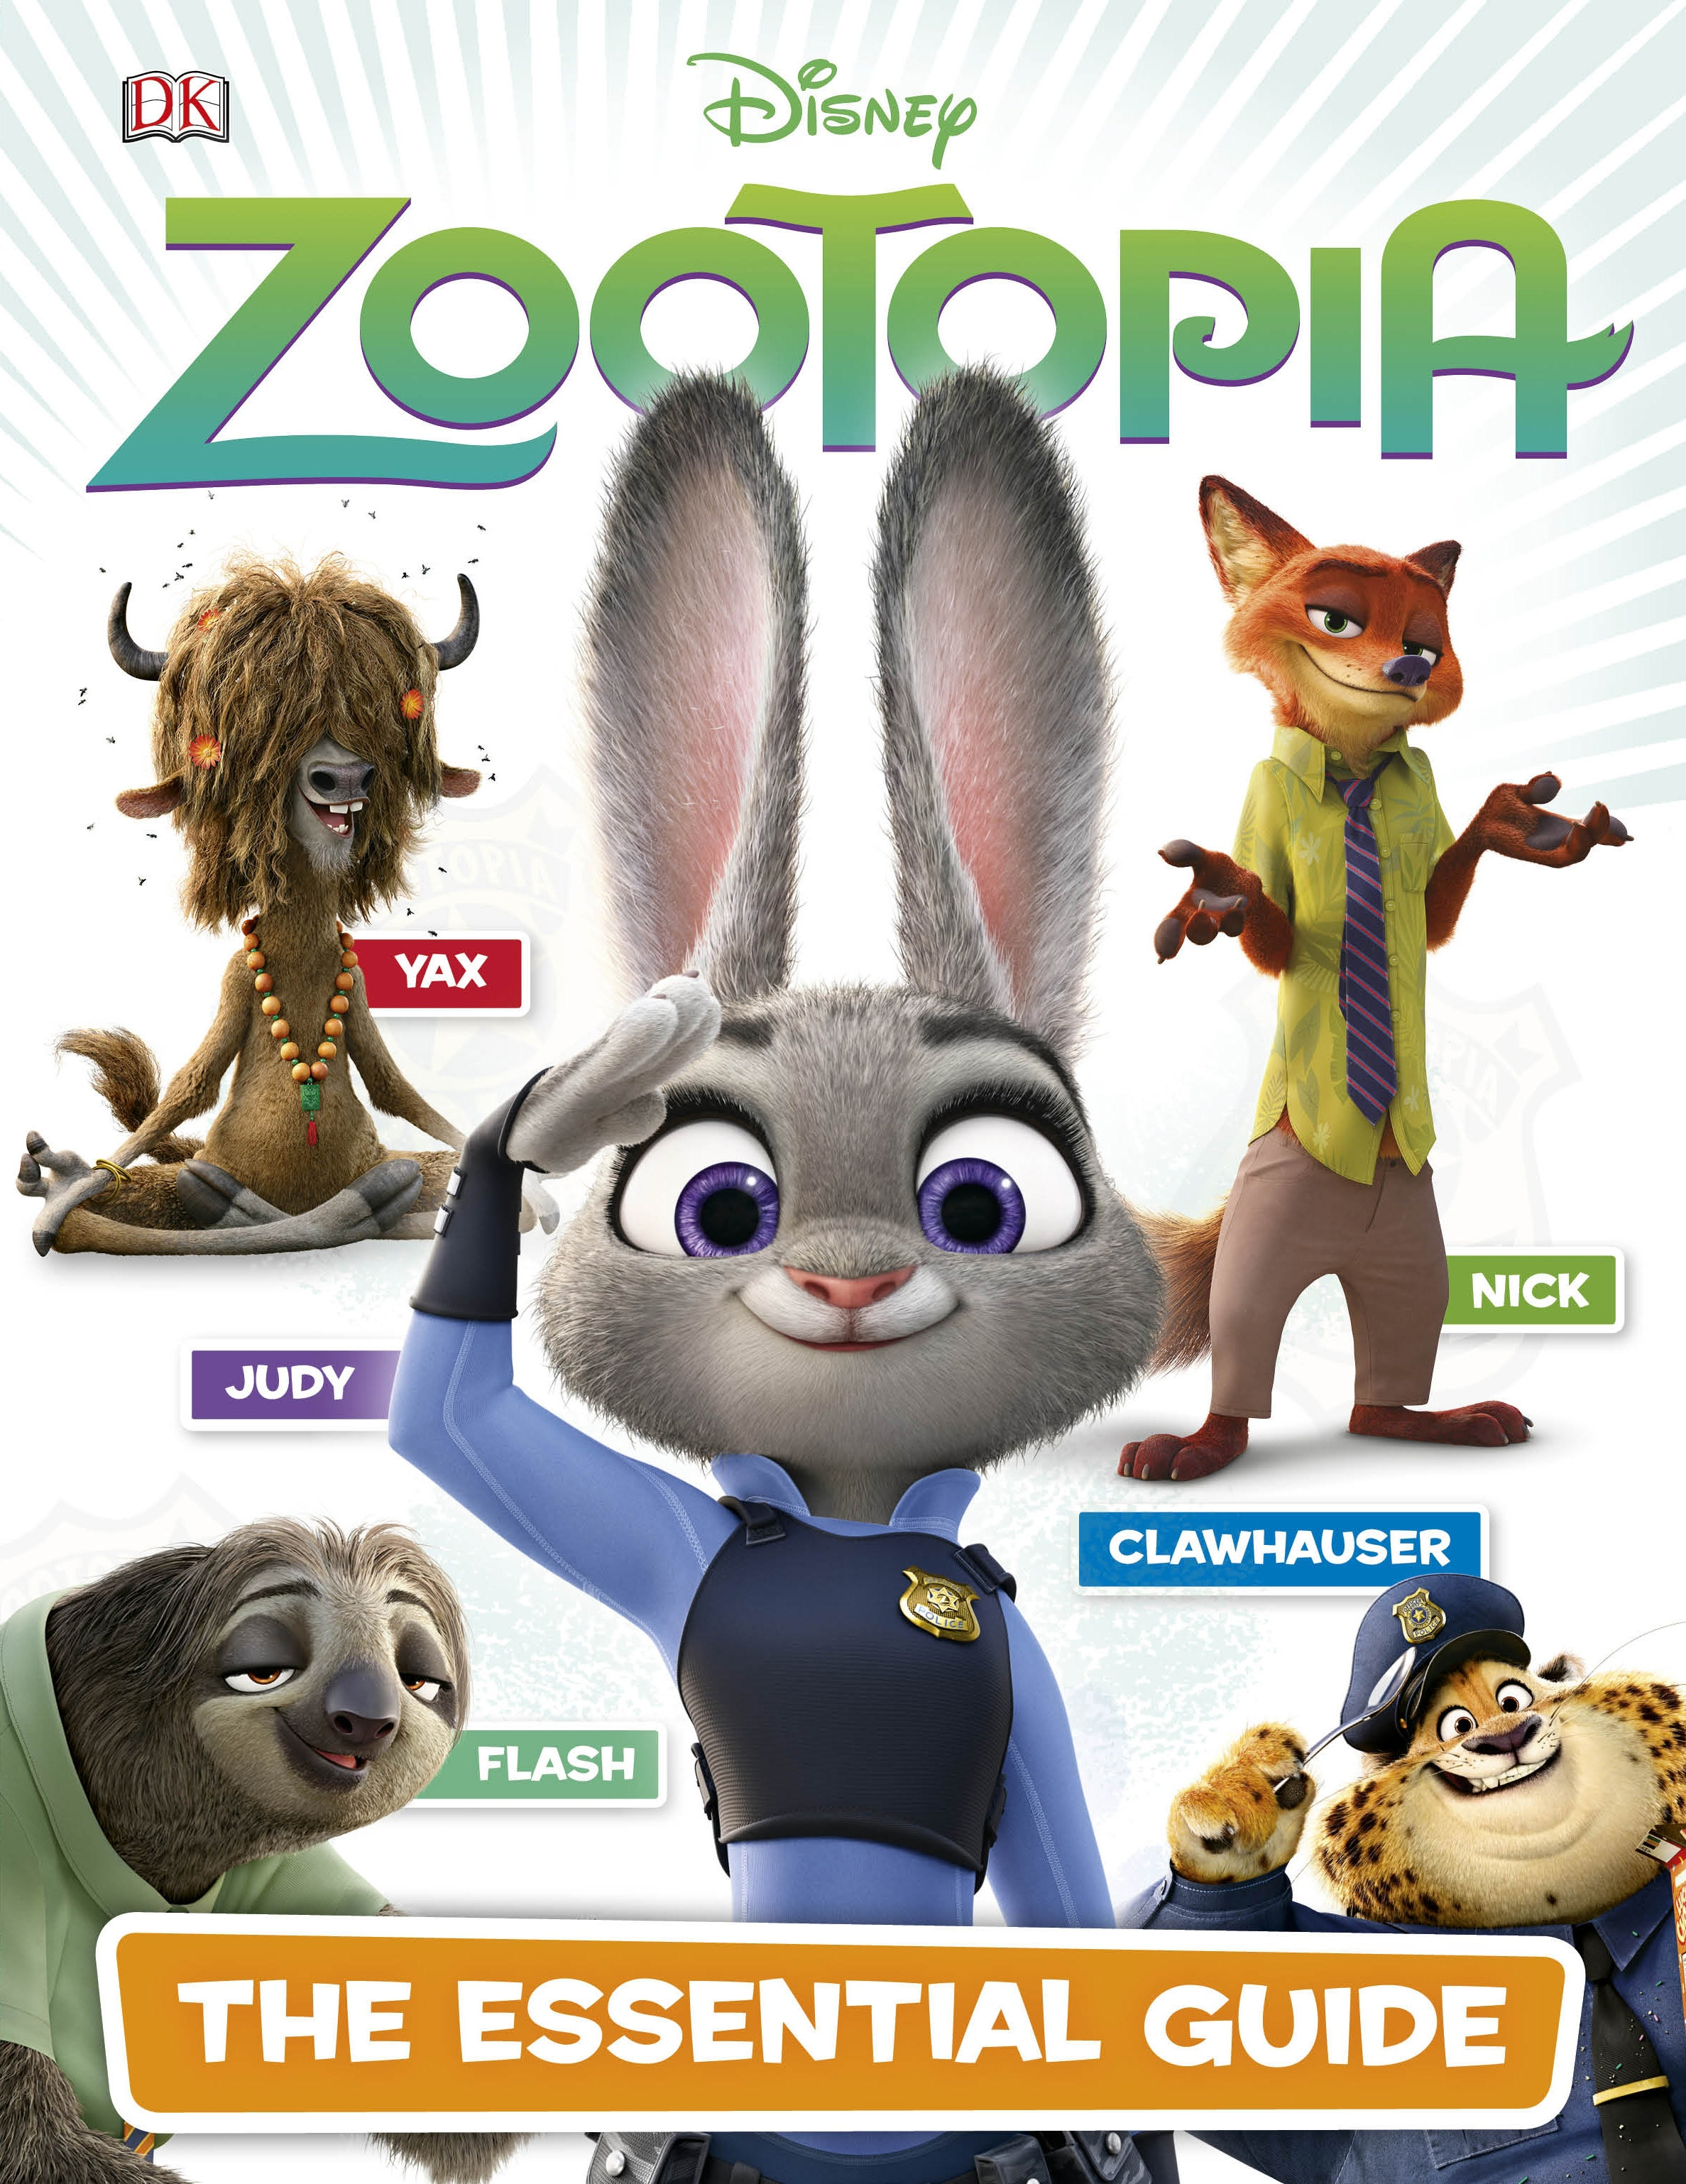 Disney Zootopiaby DK Publishing